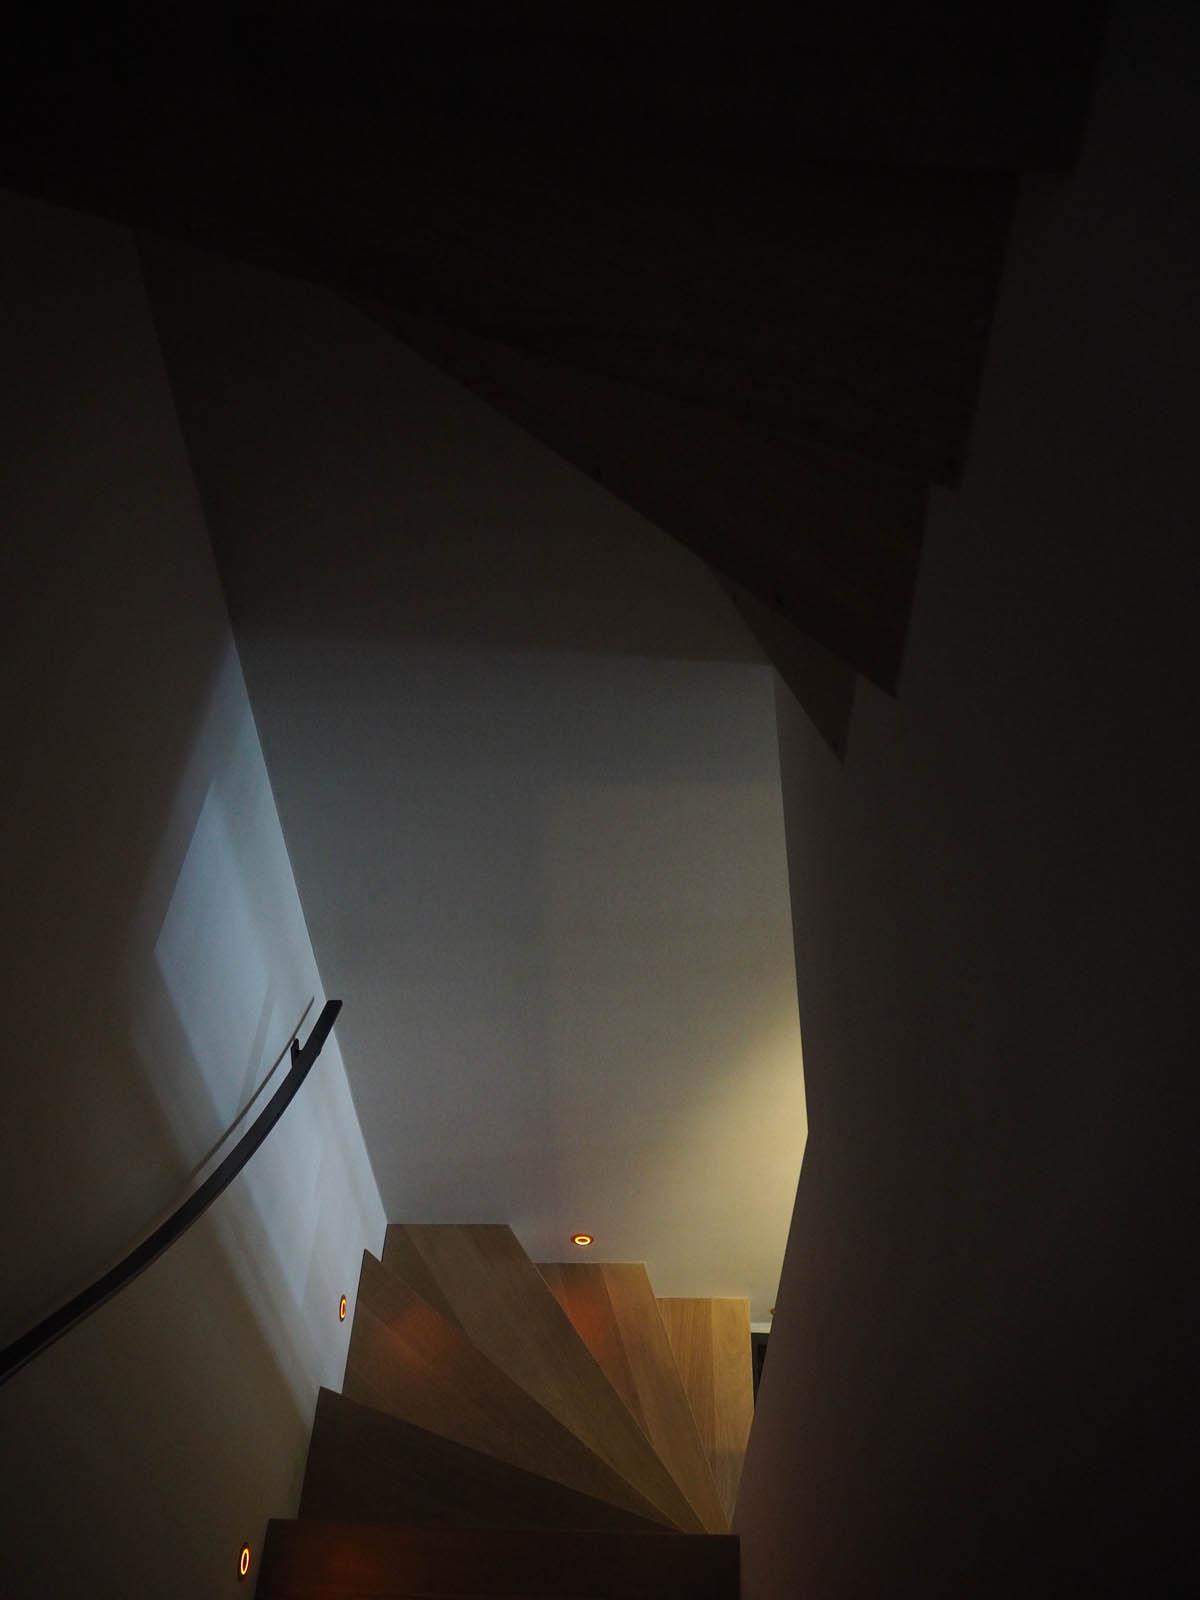 jordaan_amsterdam_grachtenpand_stairway_jeroen_de_nijs_bni